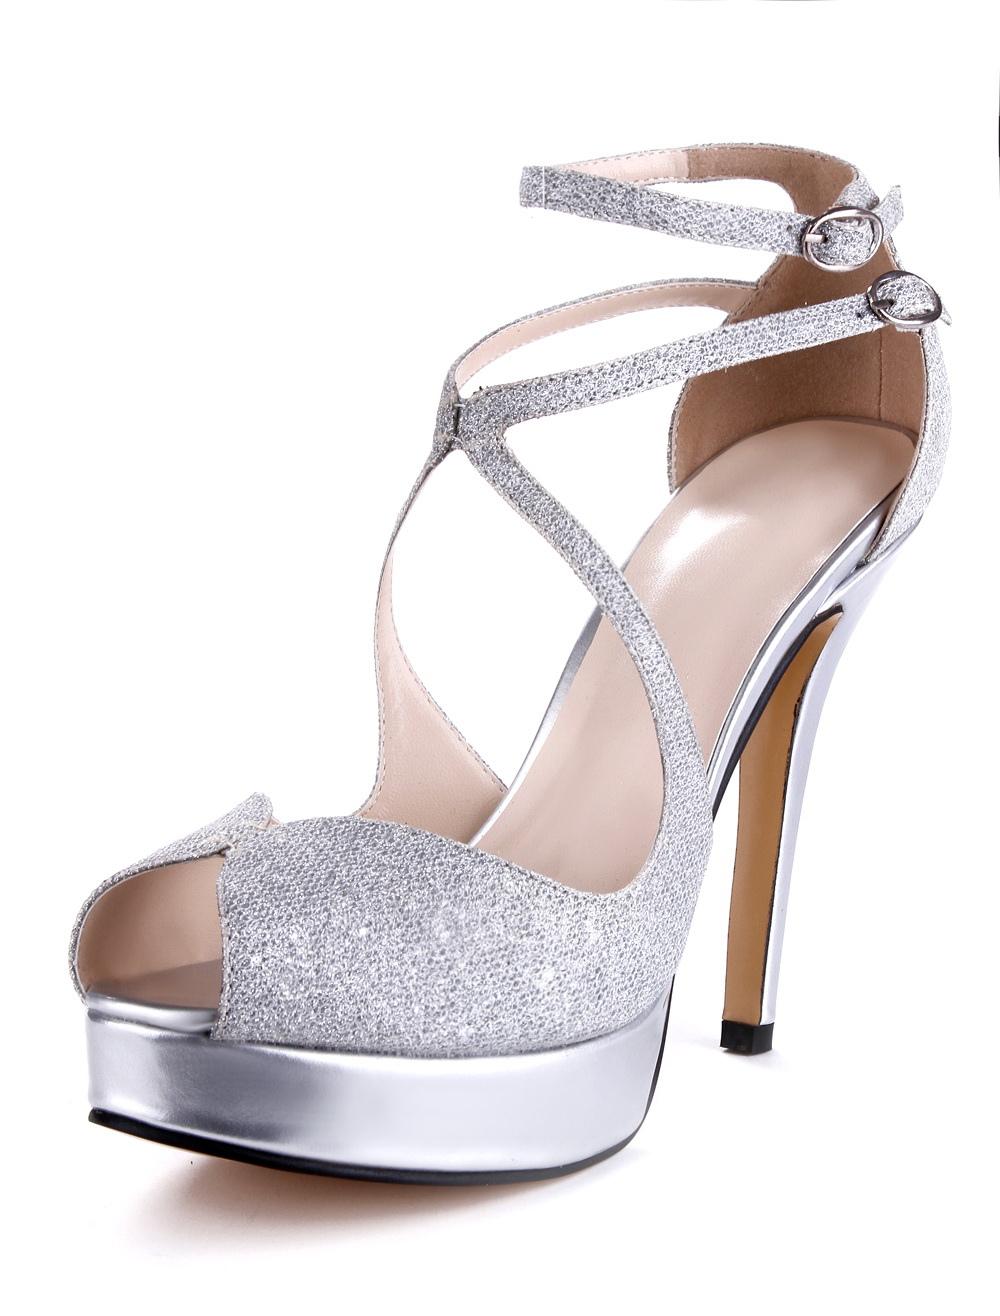 Buy Women Silver Sandals High Heel Sandals Glitter Platform Peep Toe Criss Cross Party Shoes for $47.69 in Milanoo store